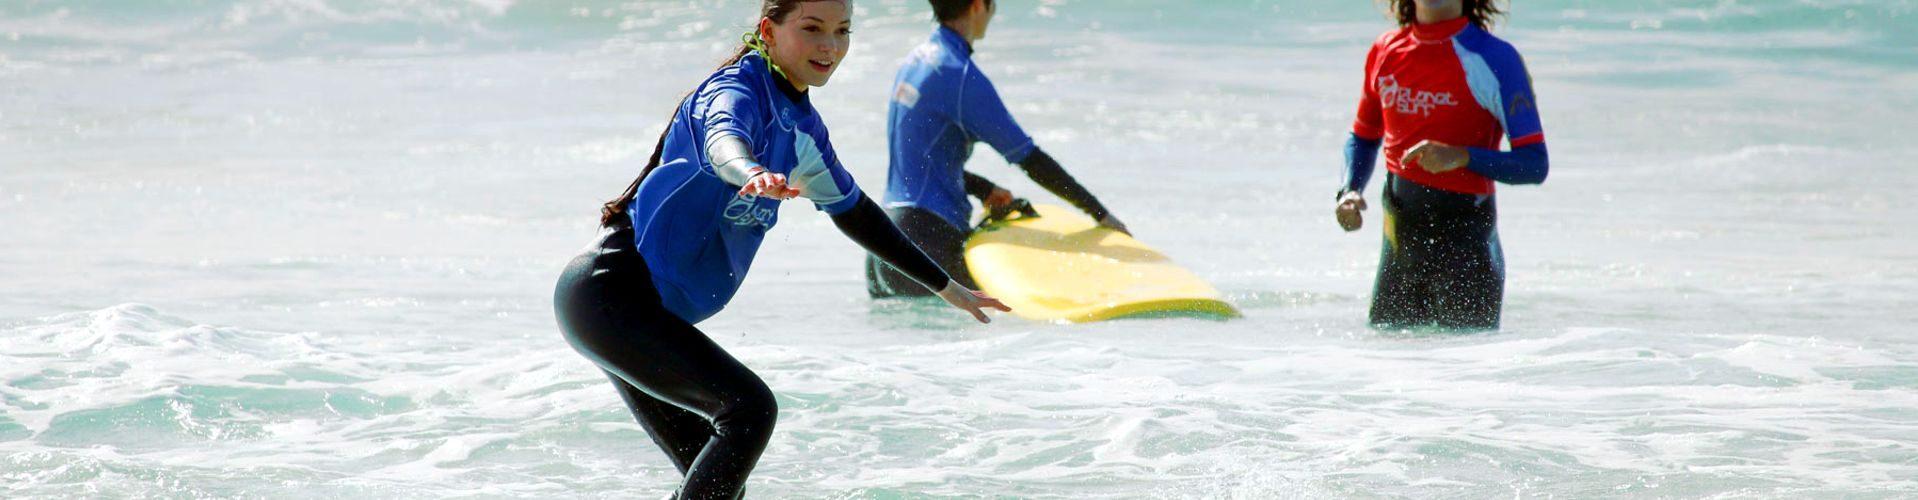 Curso de surf en Vieux Boucau